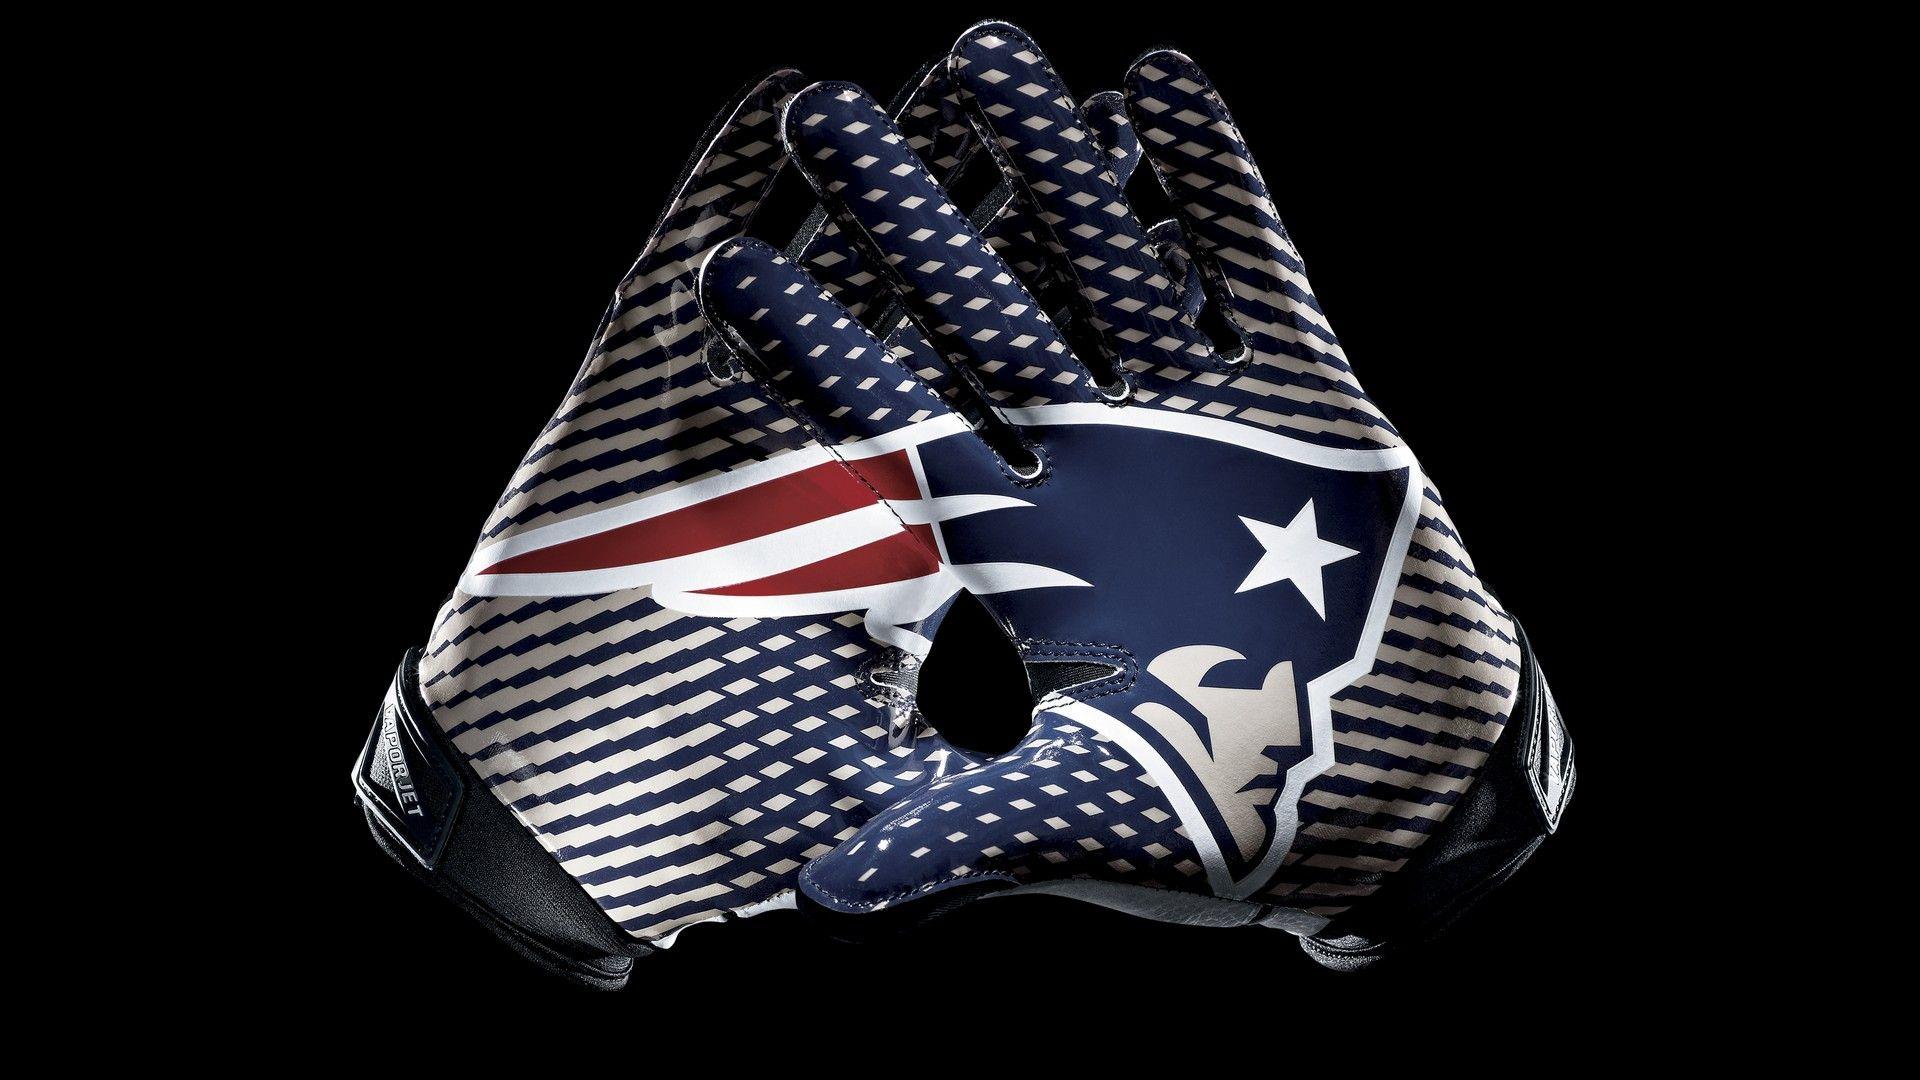 Patriots Desktop Wallpaper 2020 Nfl Football Wallpapers New England Patriots Nfl Patriots Patriots